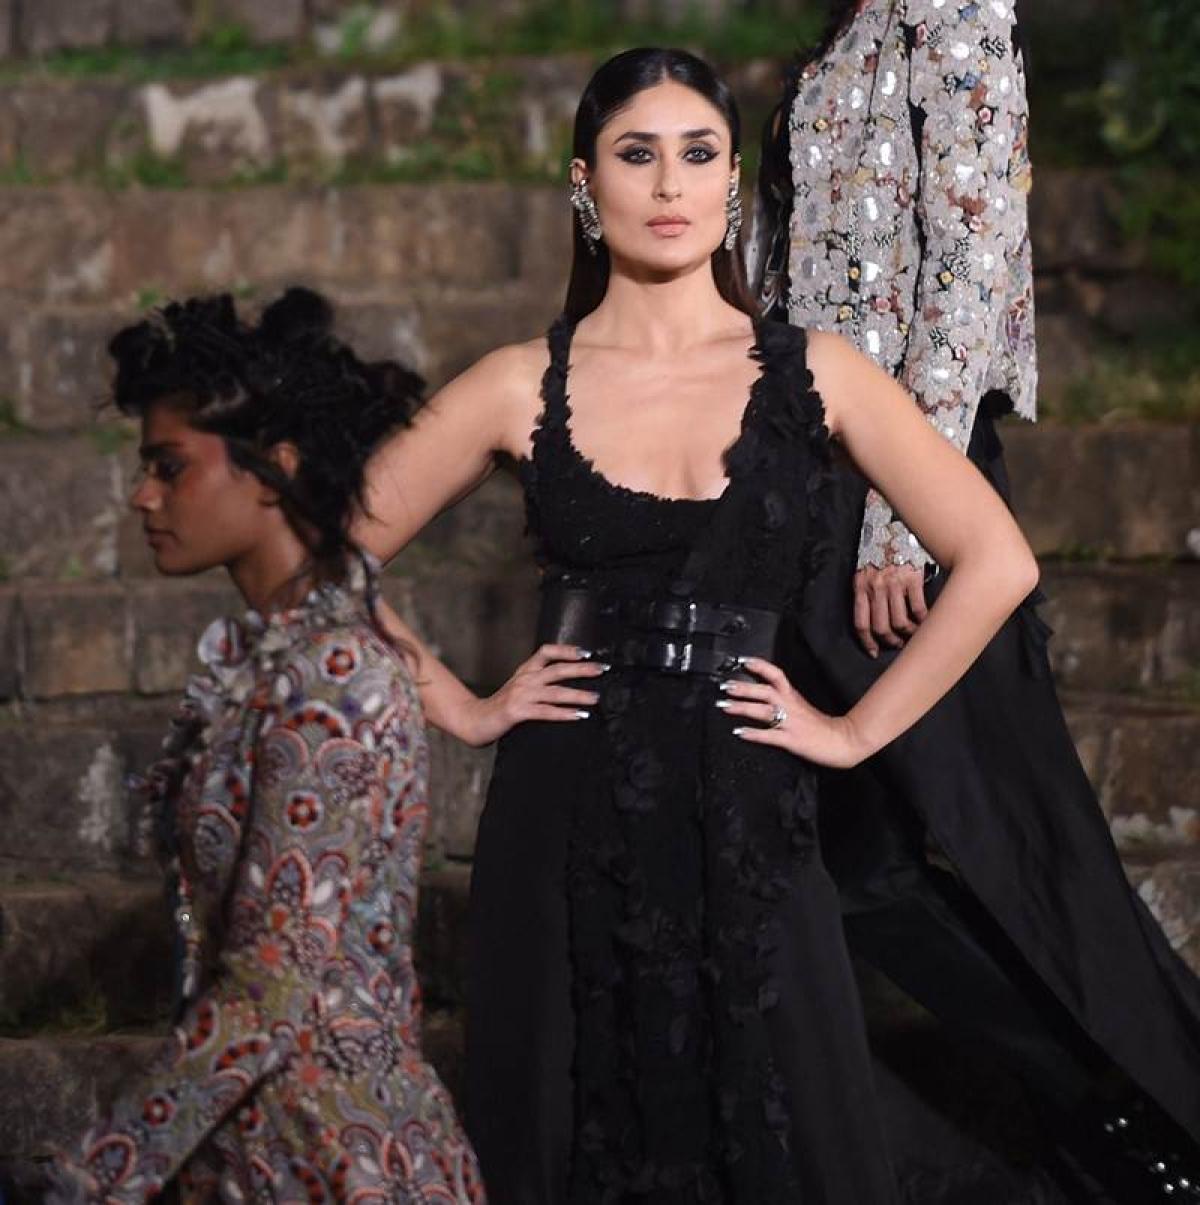 Lakme Fashion Week S R 2018 Finale: Kareena Kapoor Khan looks pristine in Anamika Khanna's design